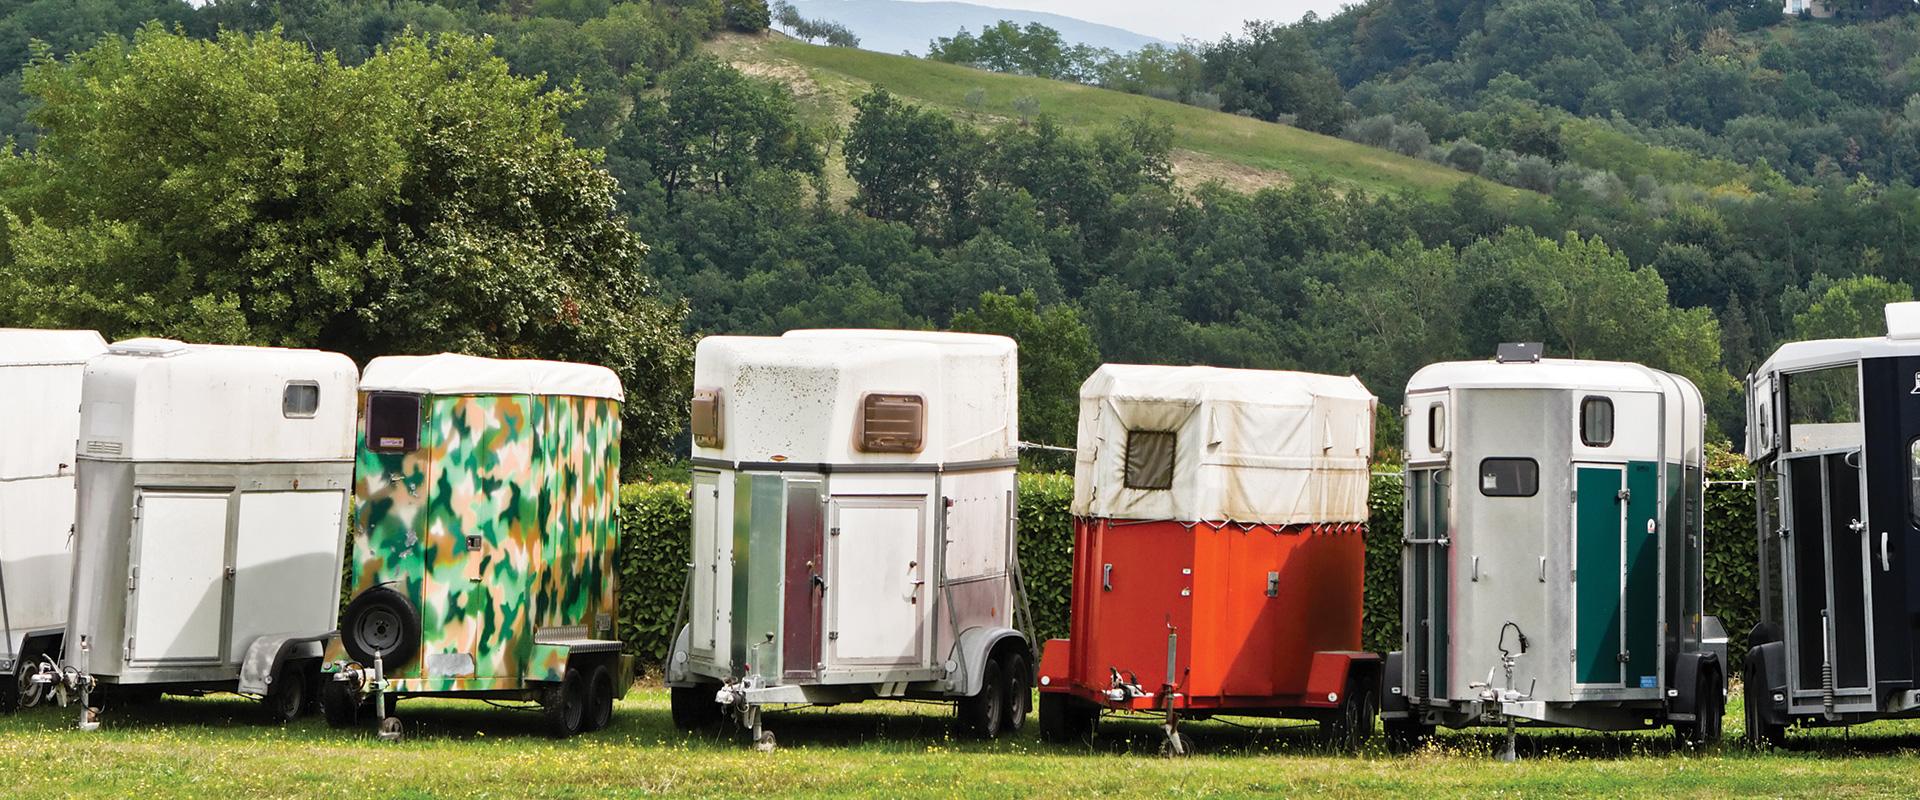 Horse trailer insurance image